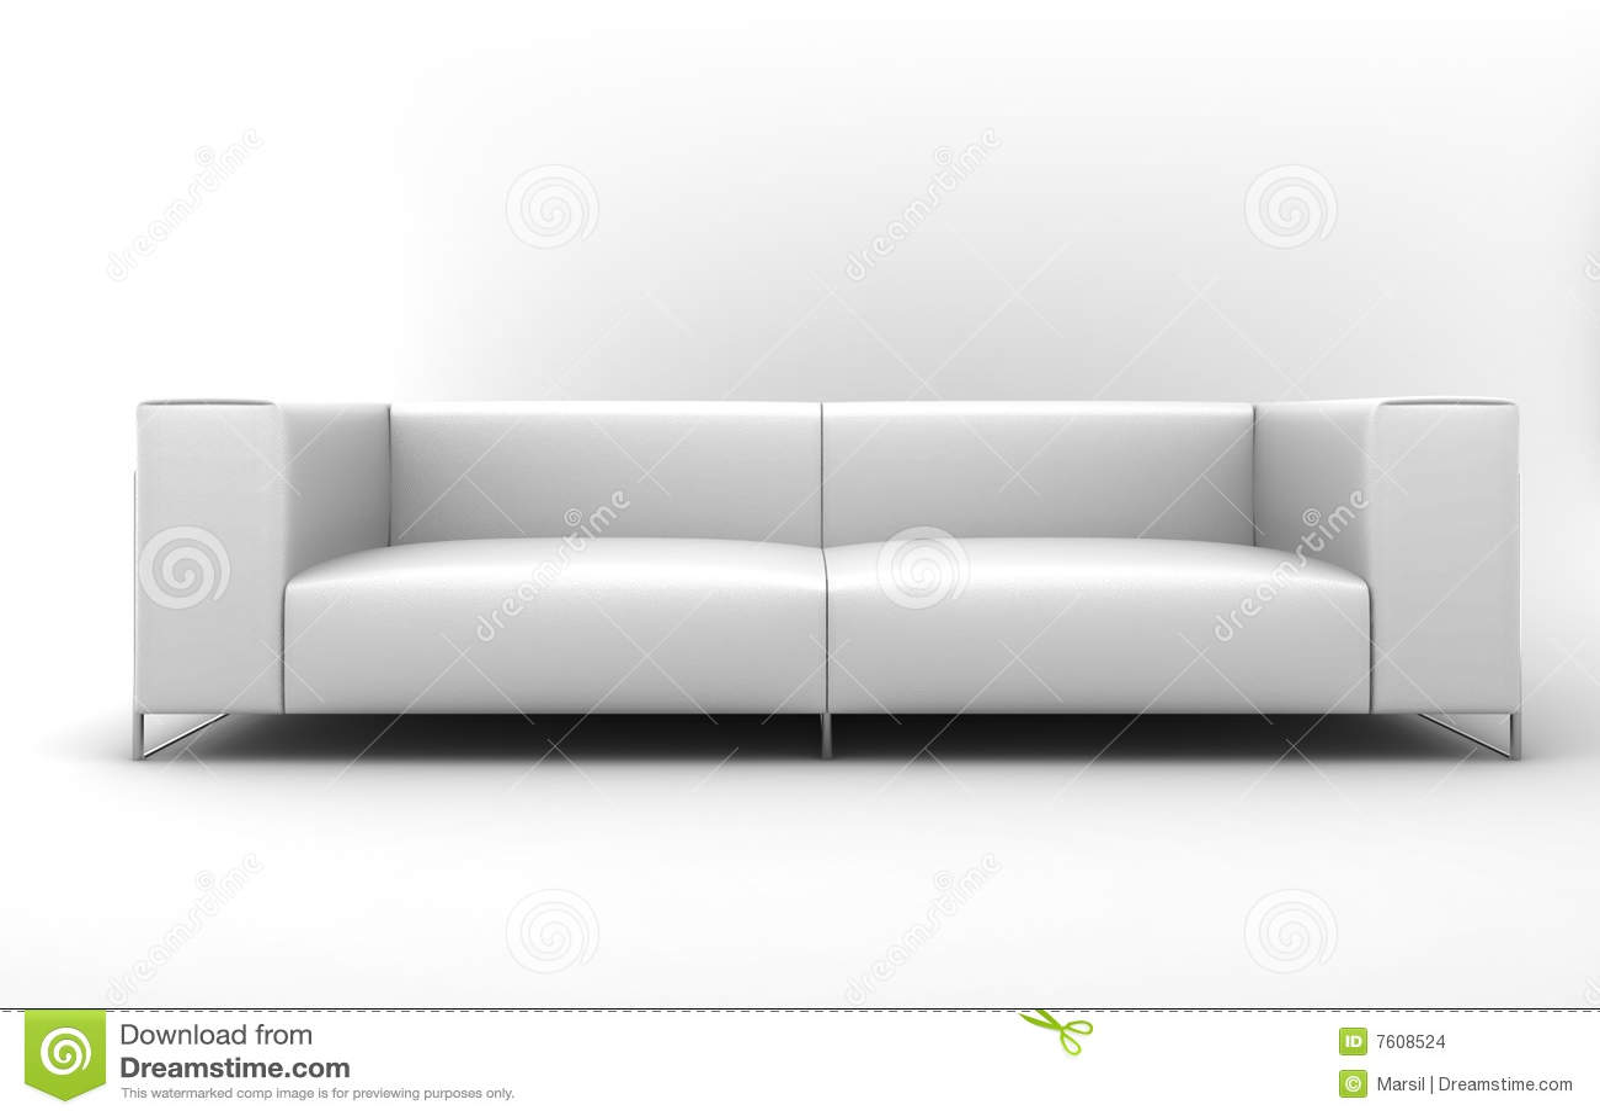 Furniture. Sofa